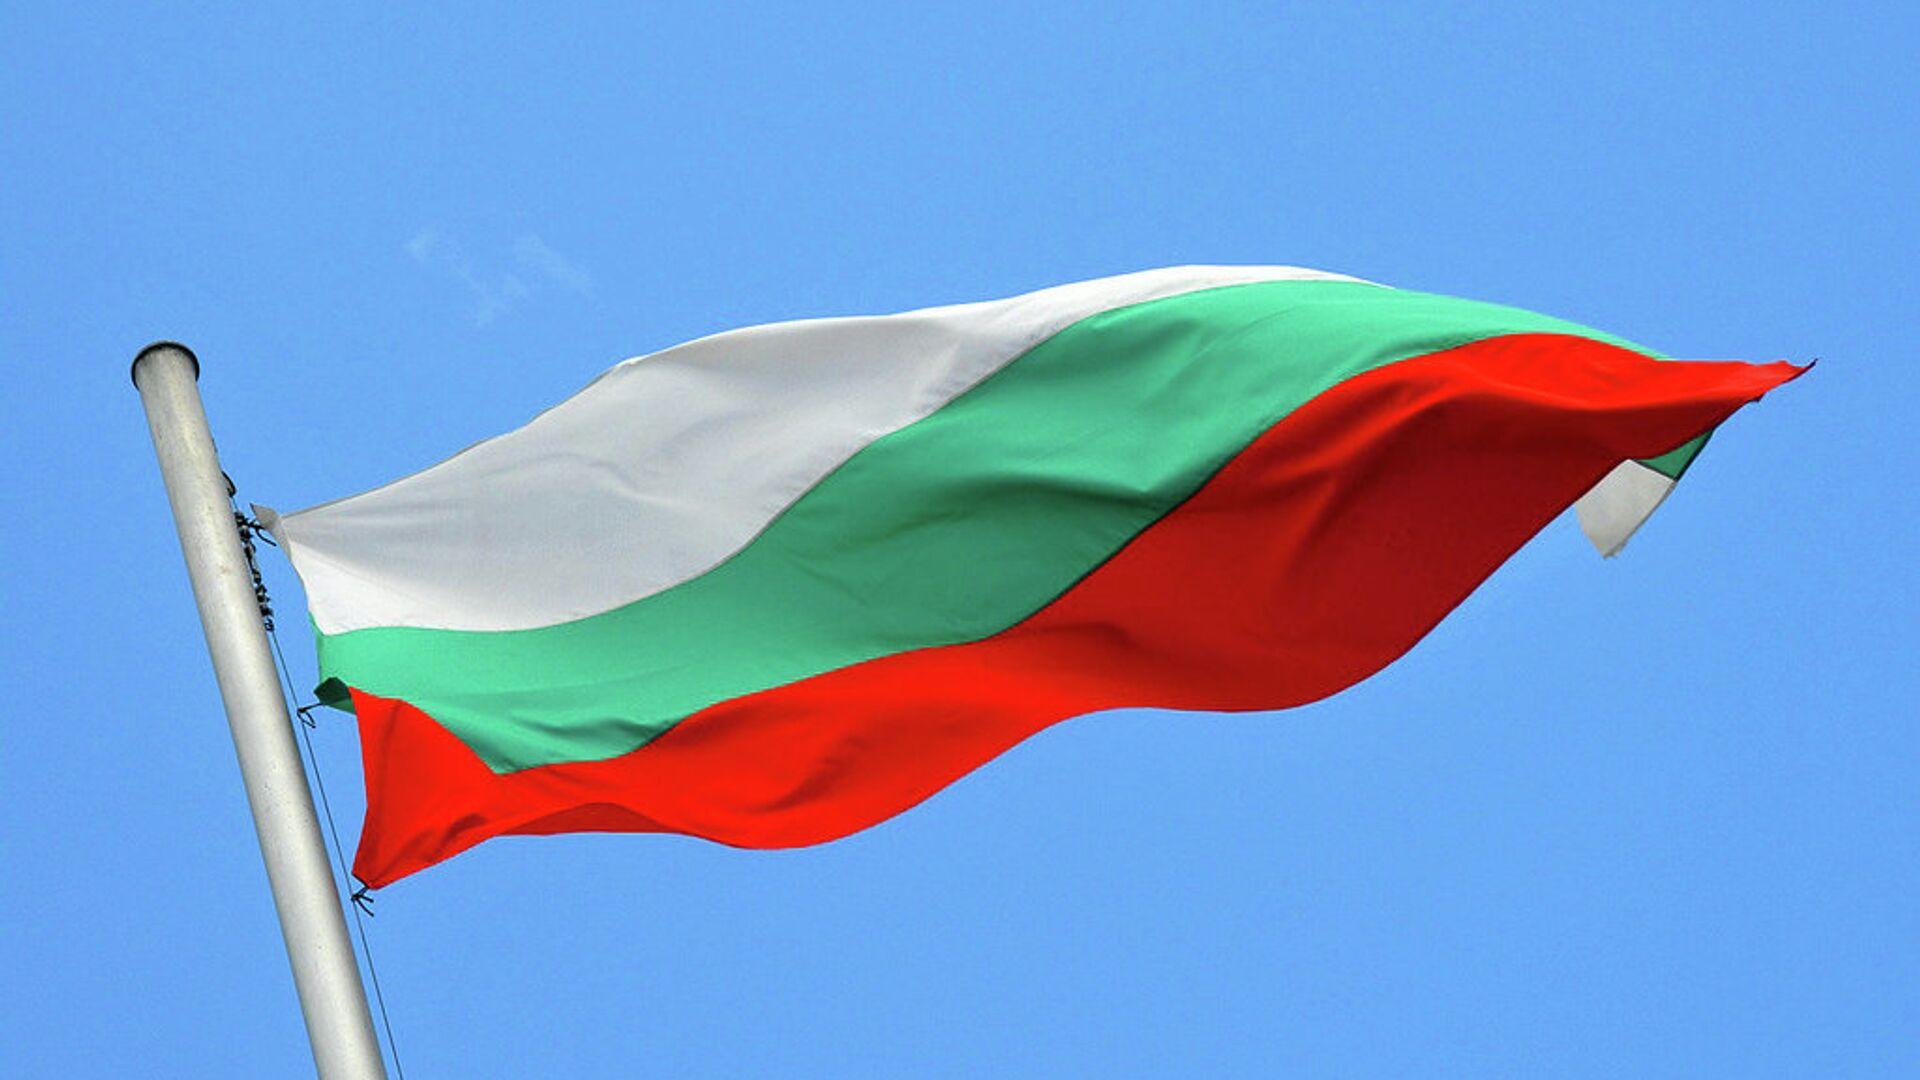 La bandiera della Bulgaria - Sputnik Italia, 1920, 20.04.2021